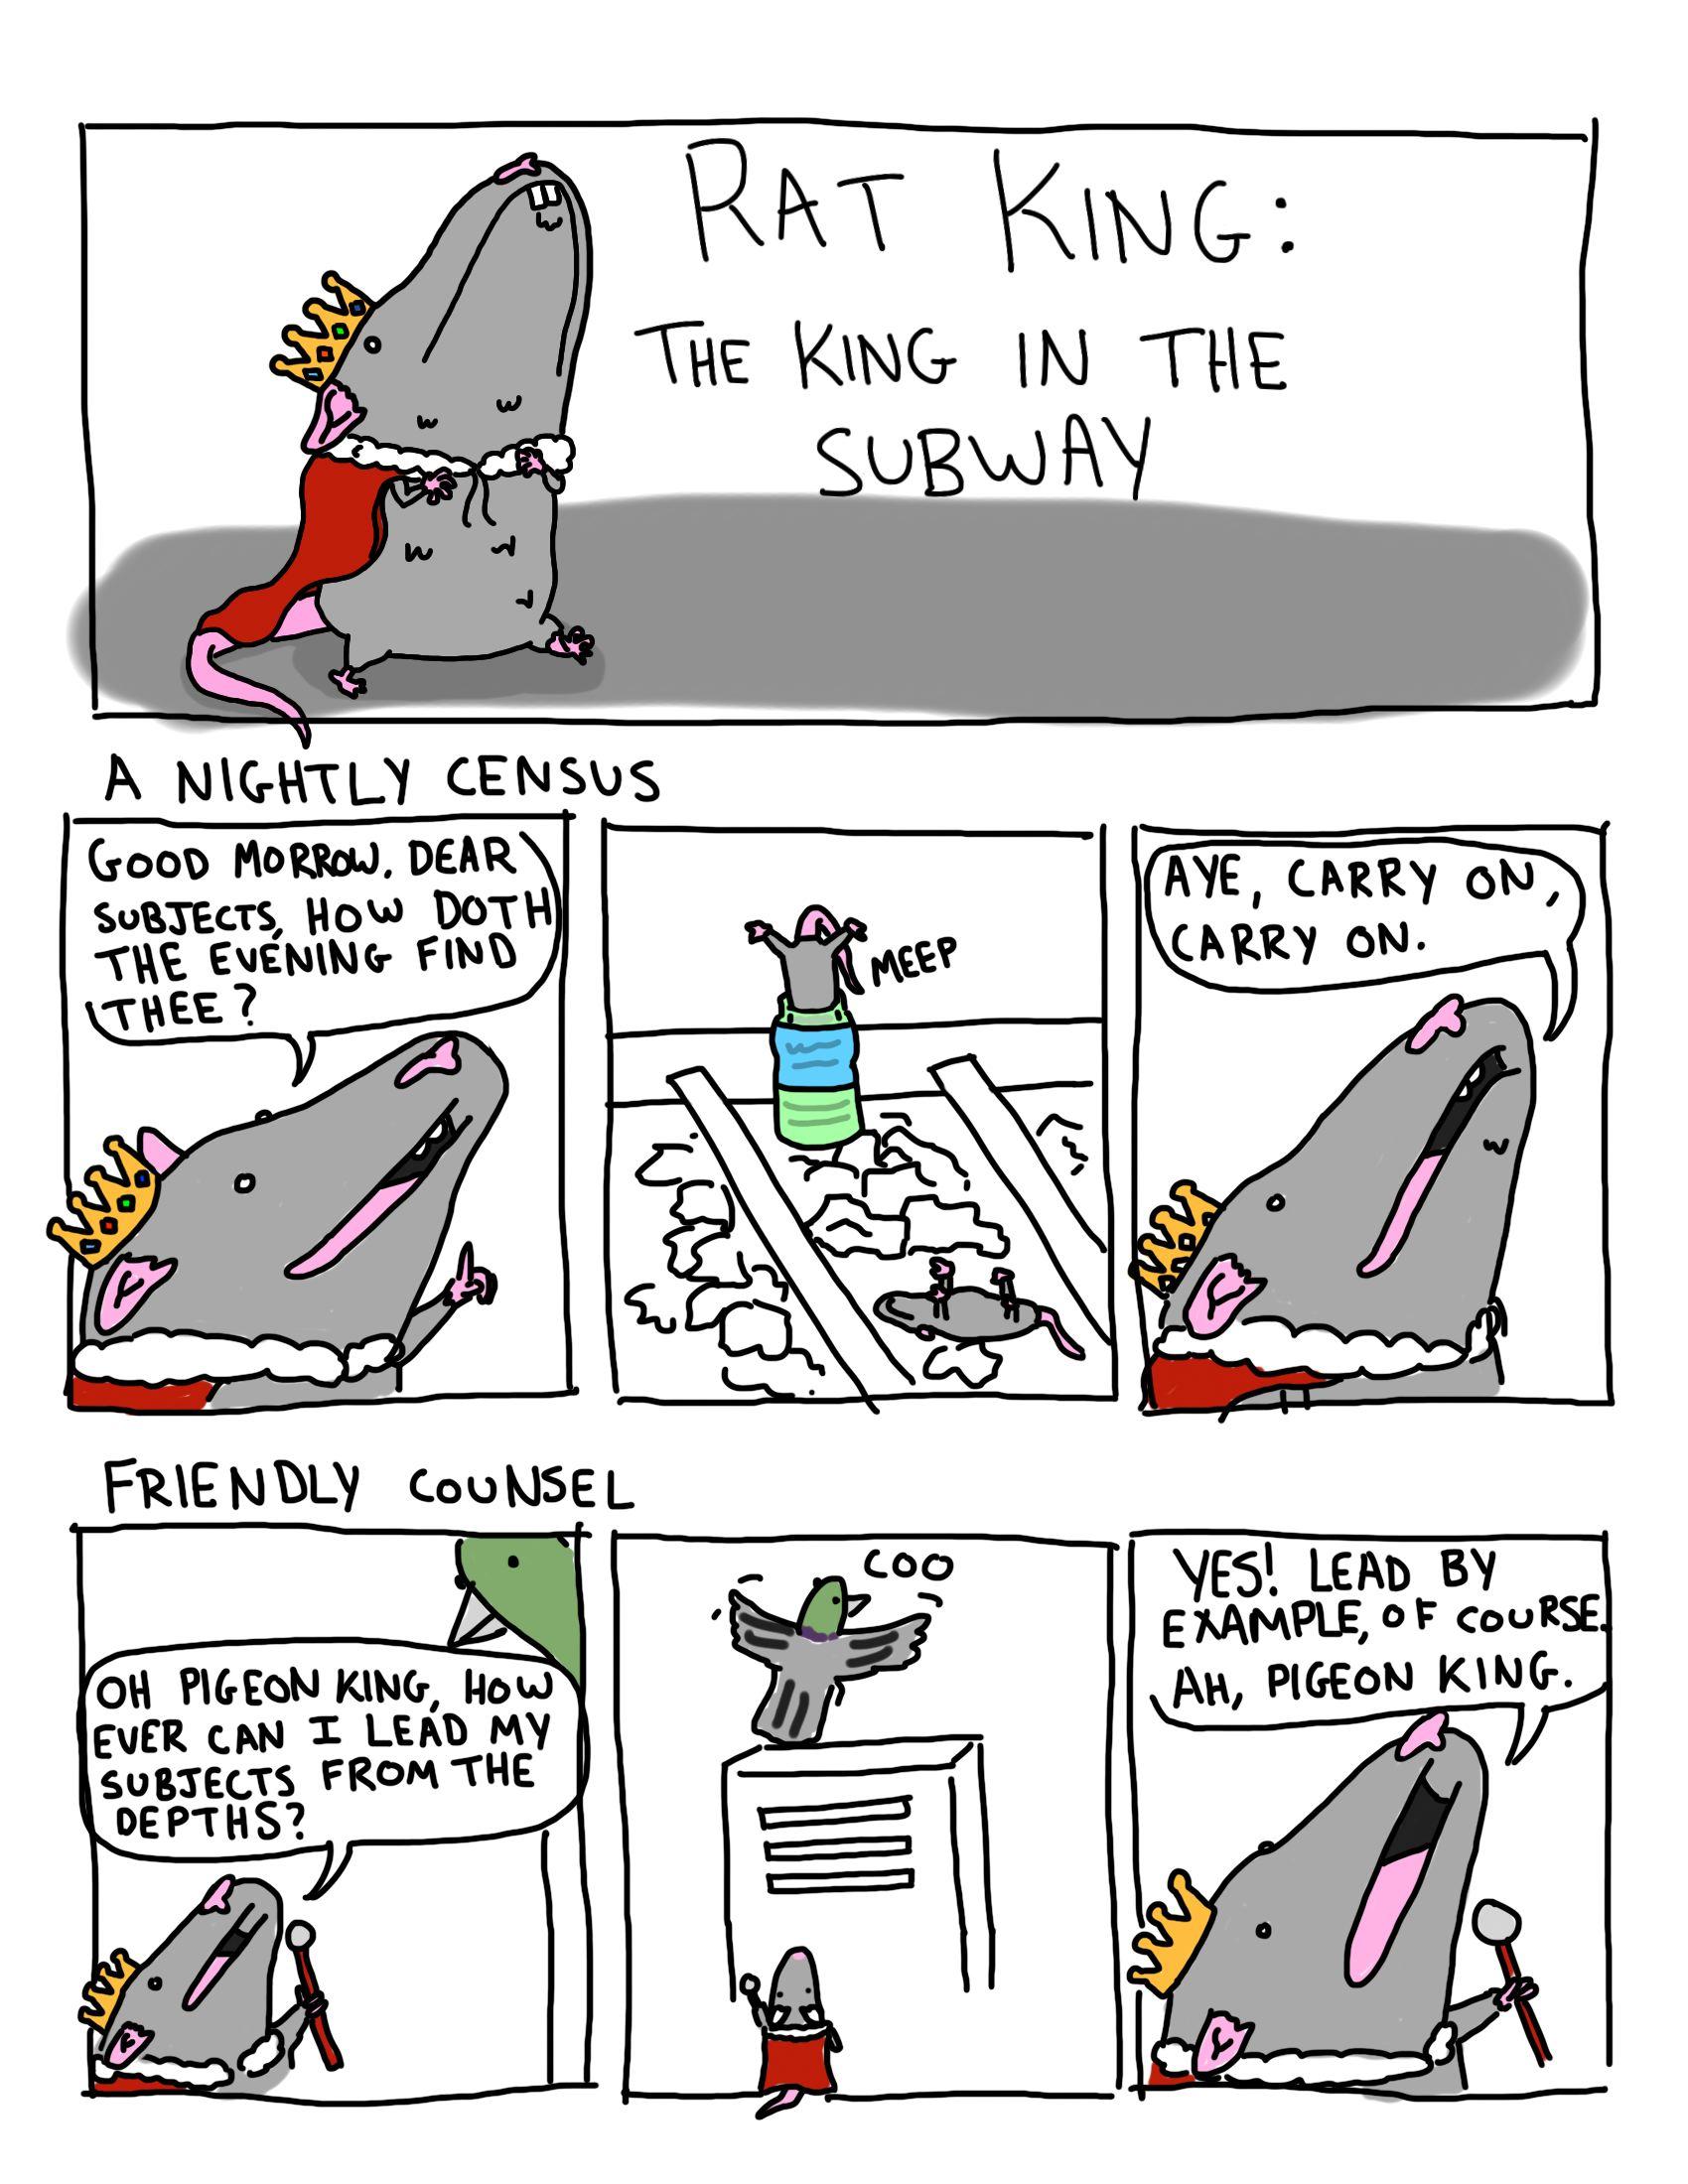 rat king1.jpg